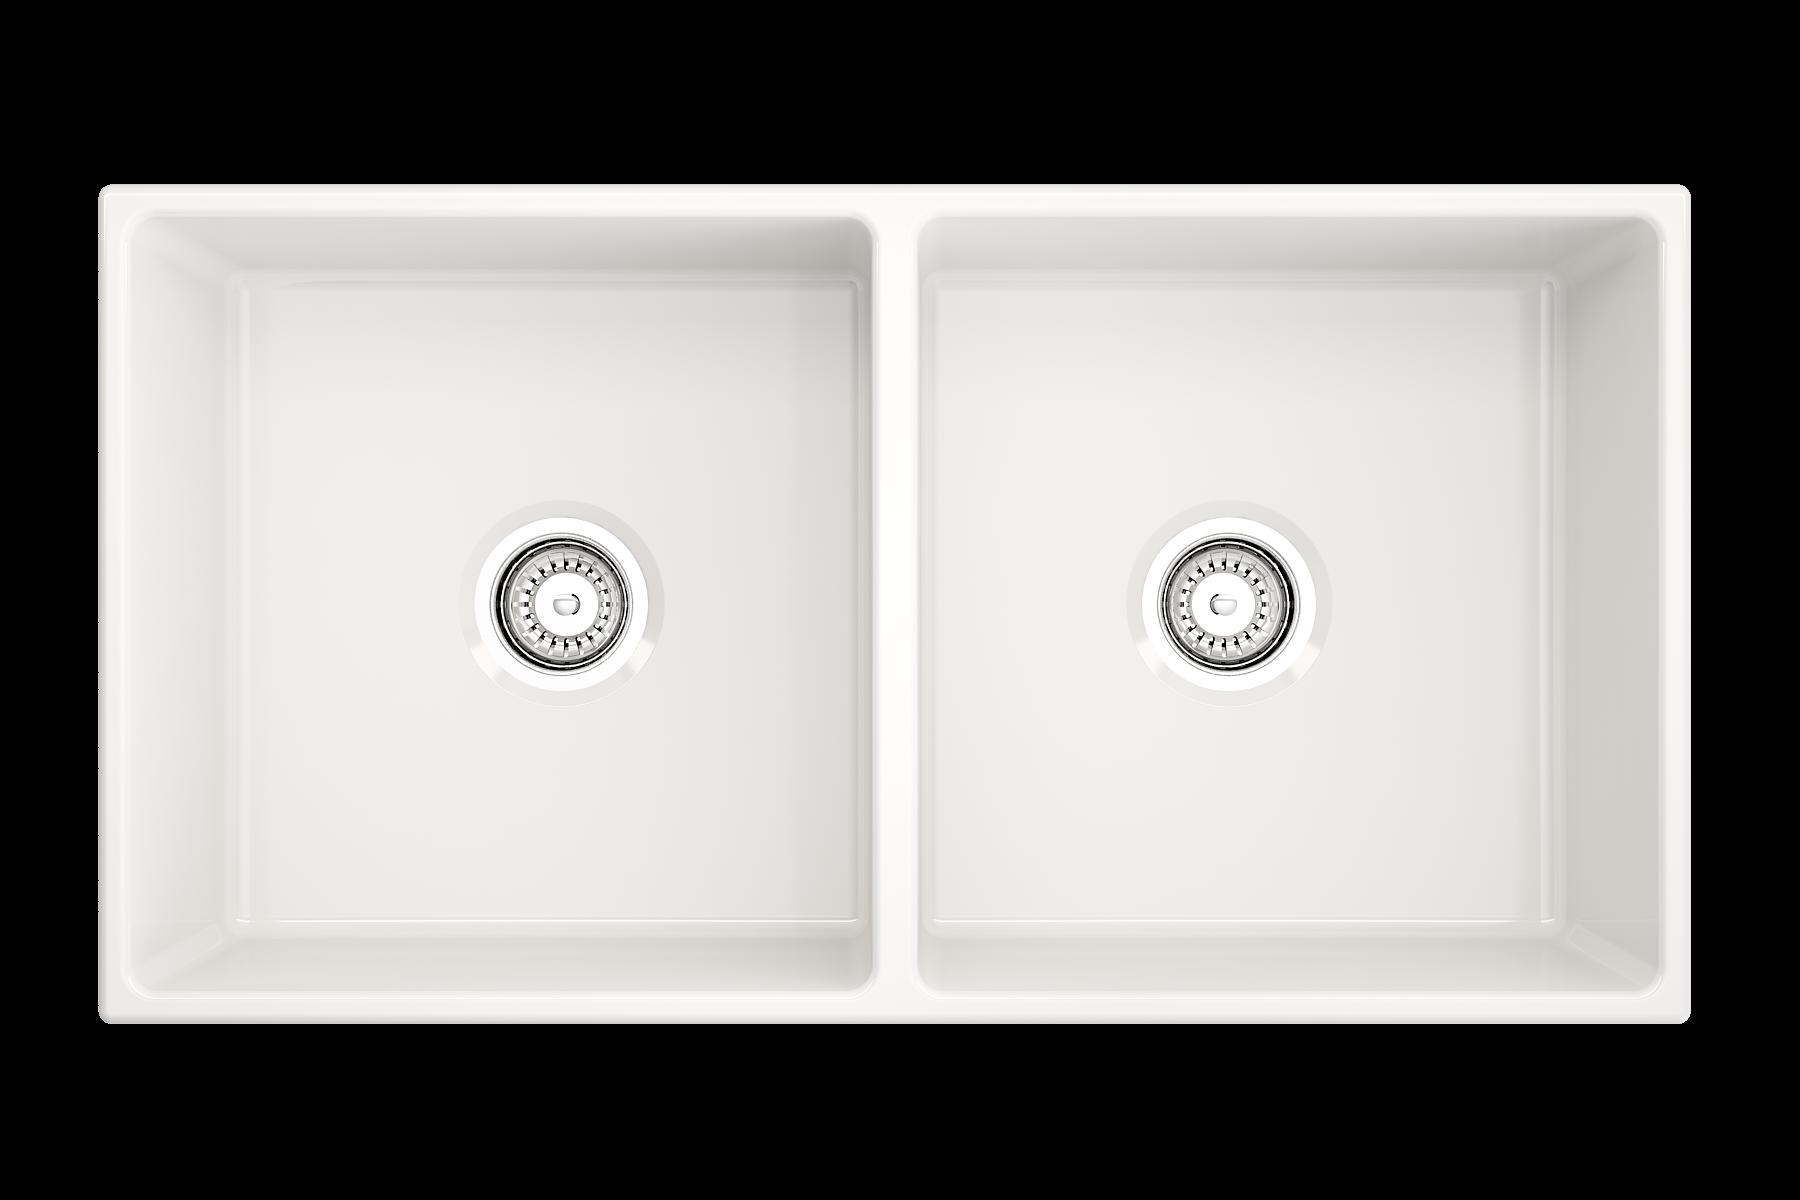 Contempo 36d Farmhouse Apron Front Fireclay 36 Double Bowl Kitchen Sink White